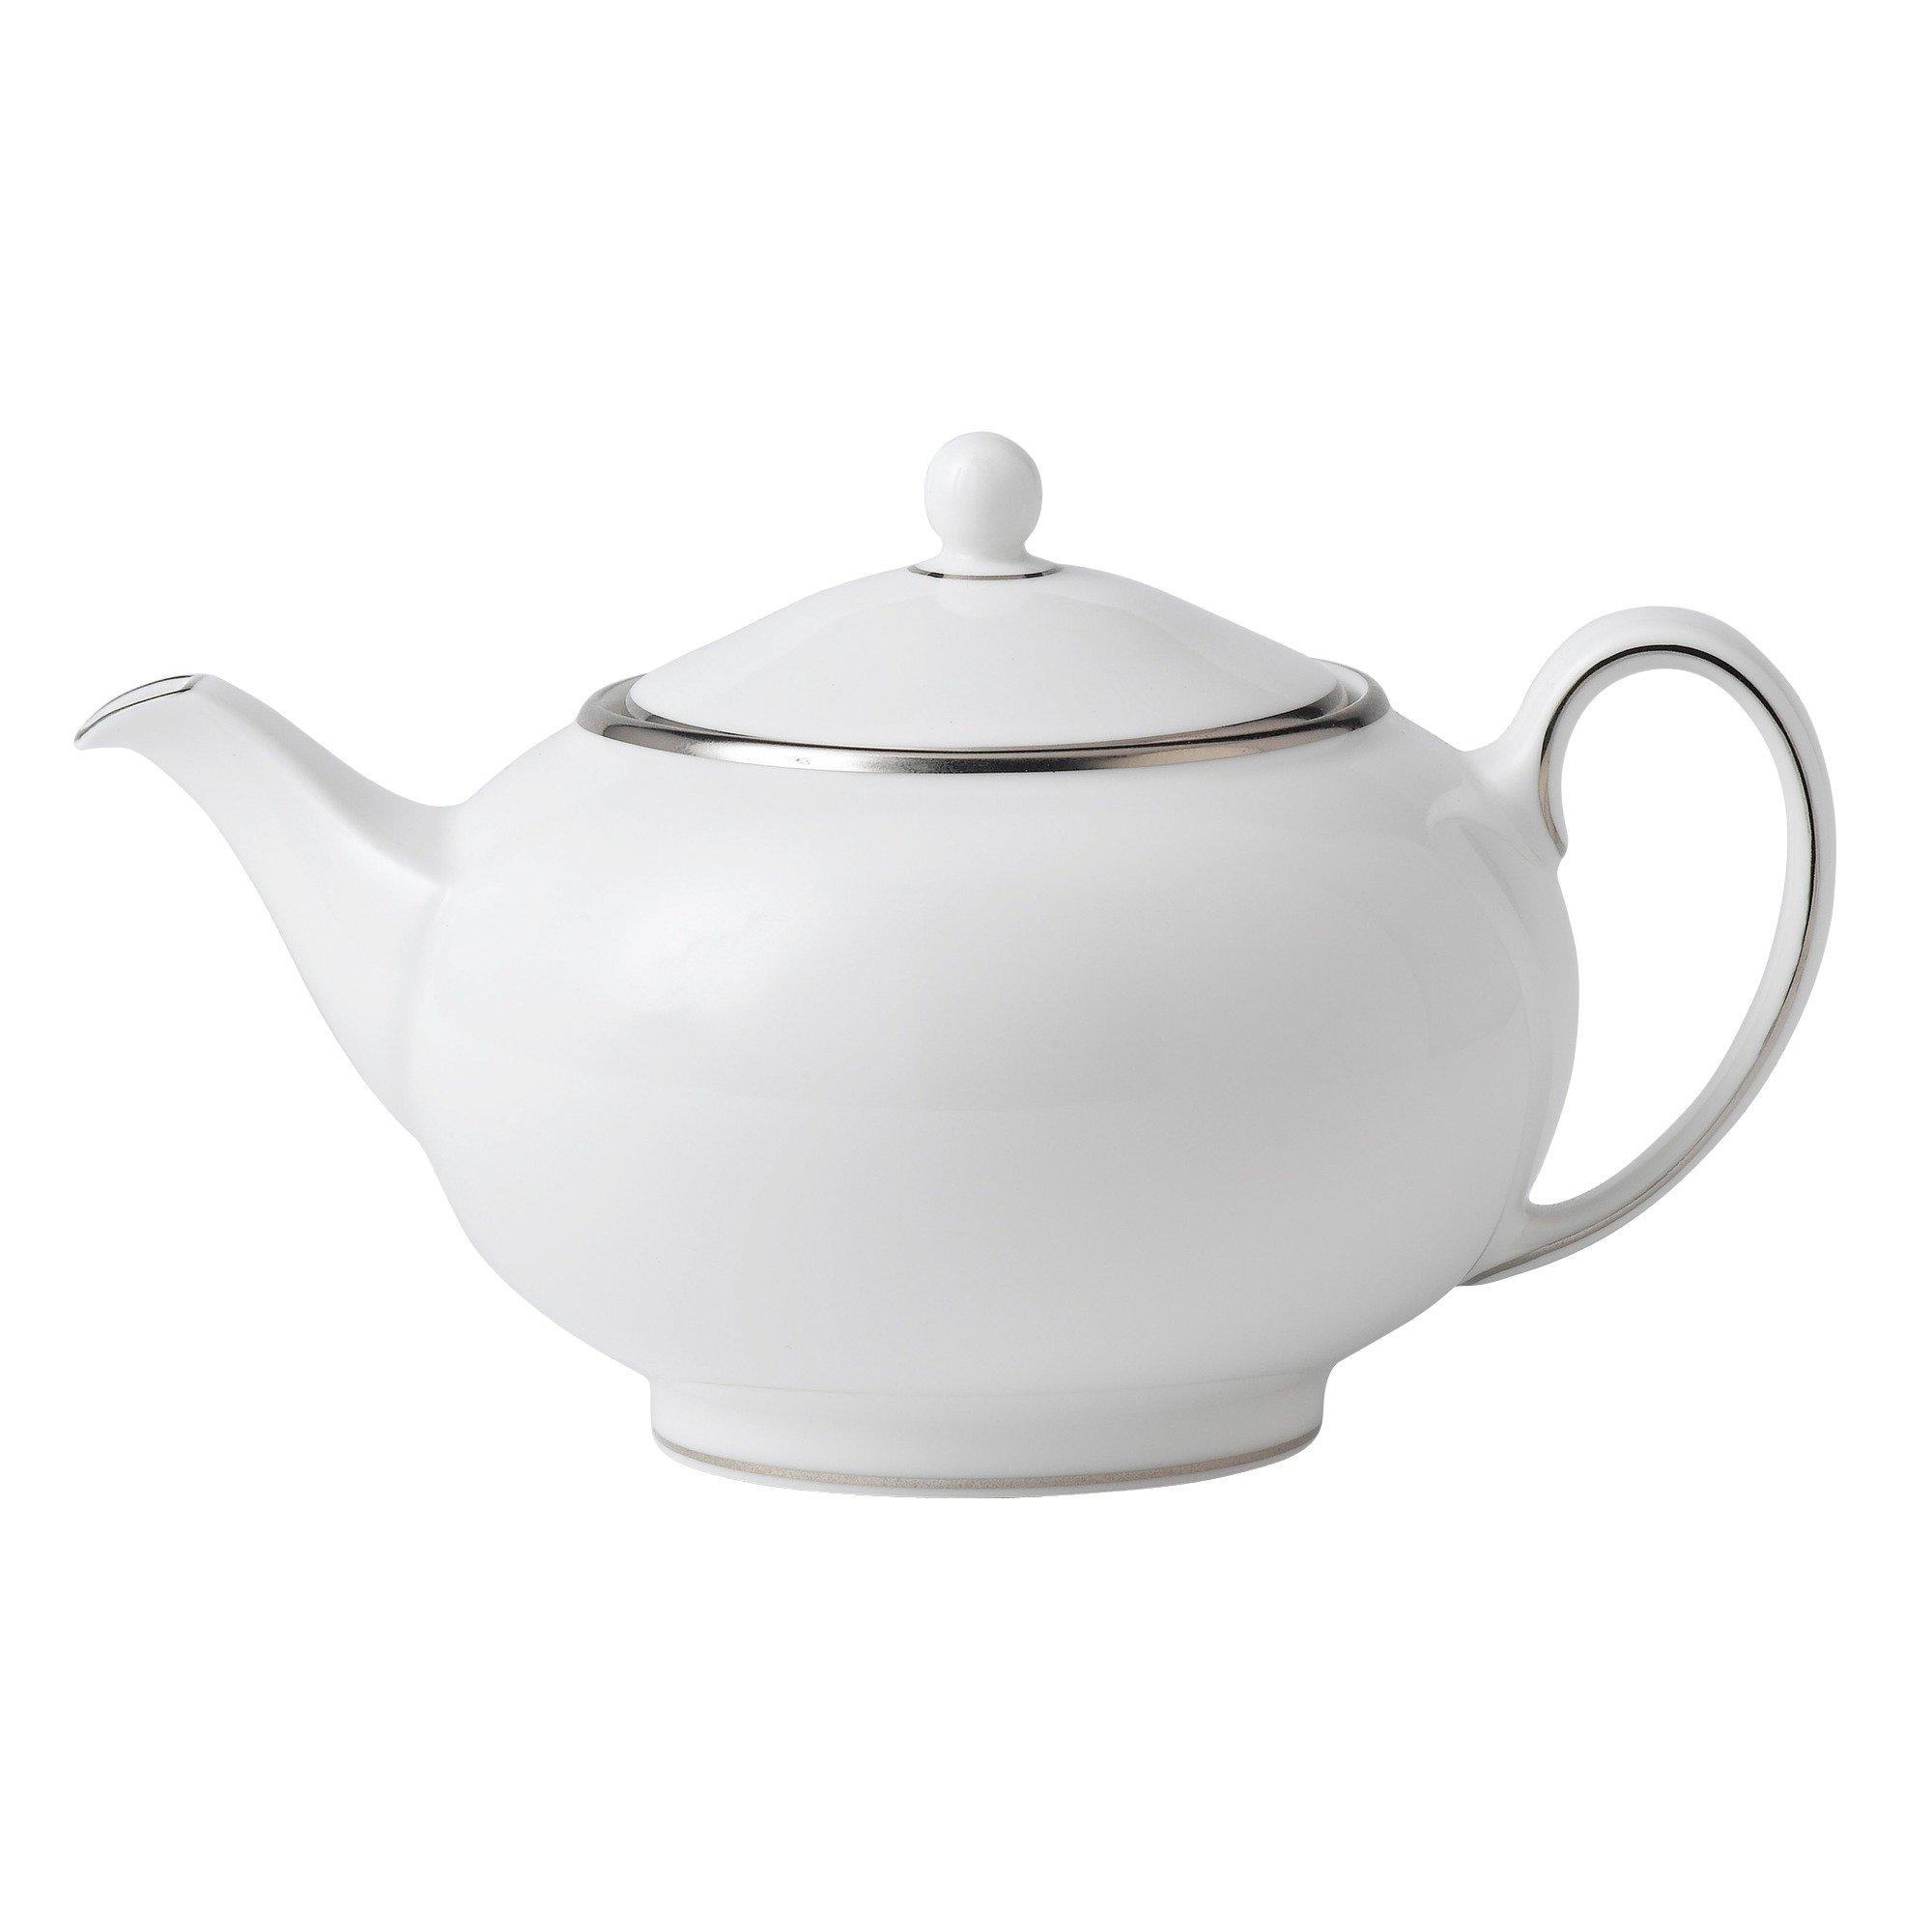 Wedgwood Sterling 1.4-Pint Teapot